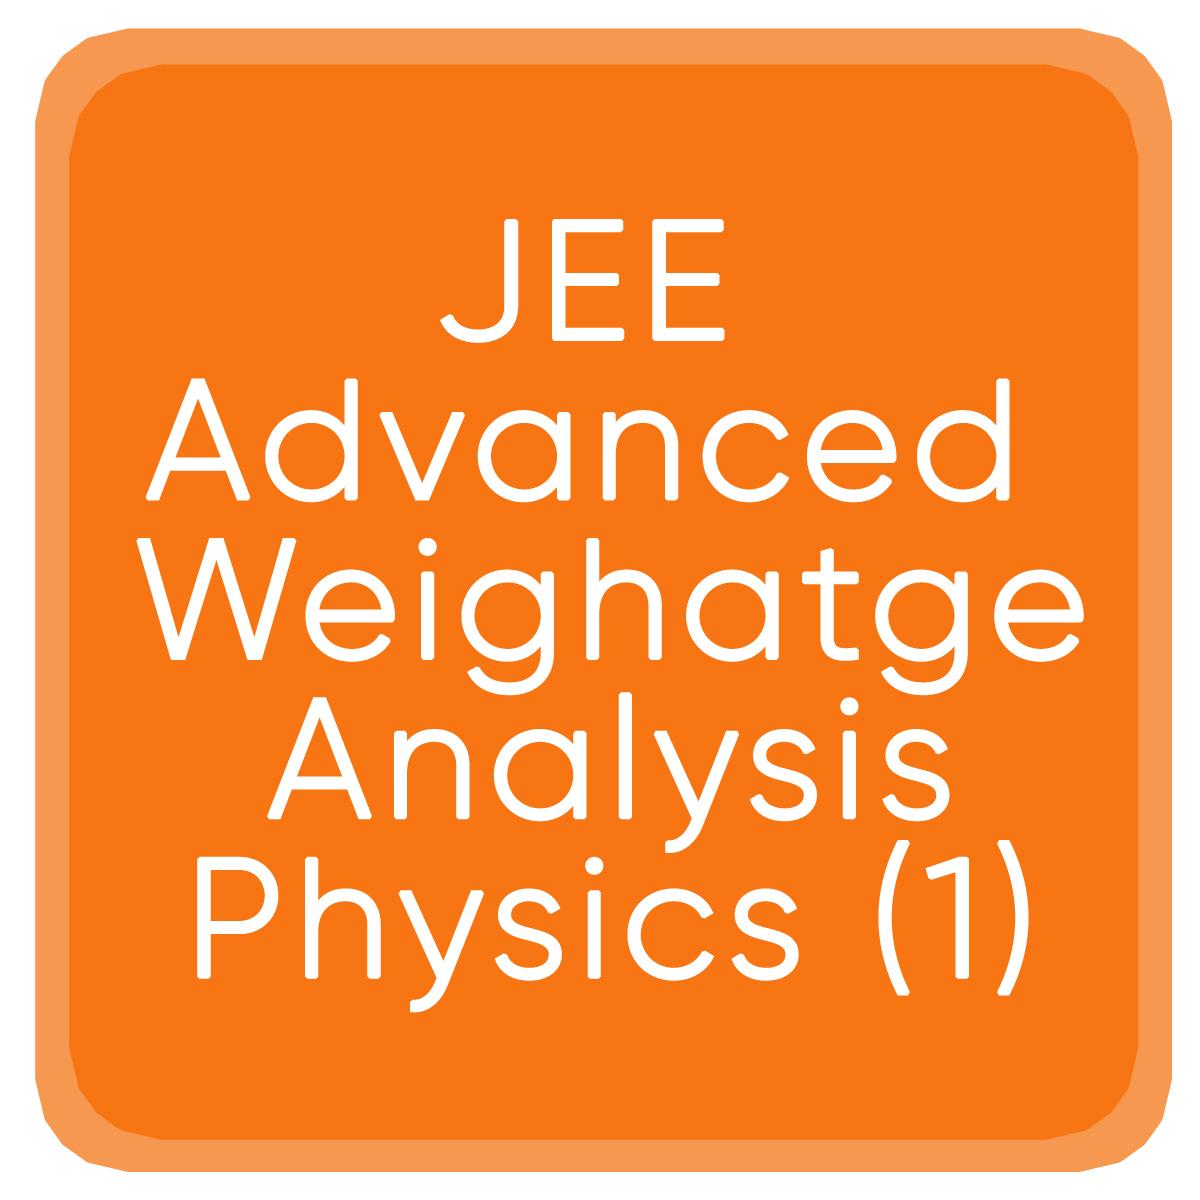 Jee Advanced Weighatge Analysis Physics (1)